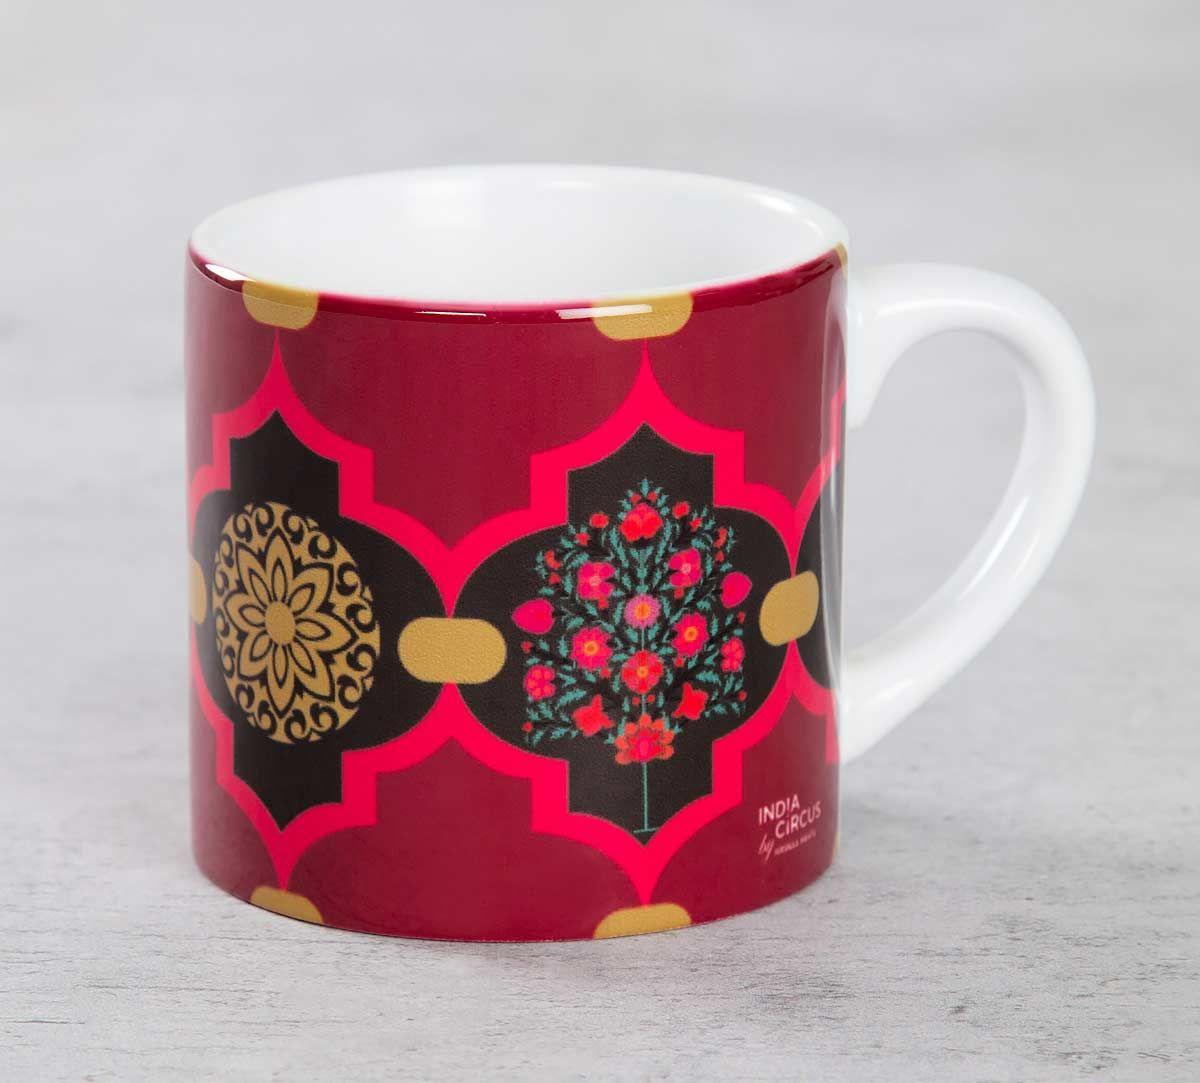 India Circus Latticed Synergy Espresso Mug